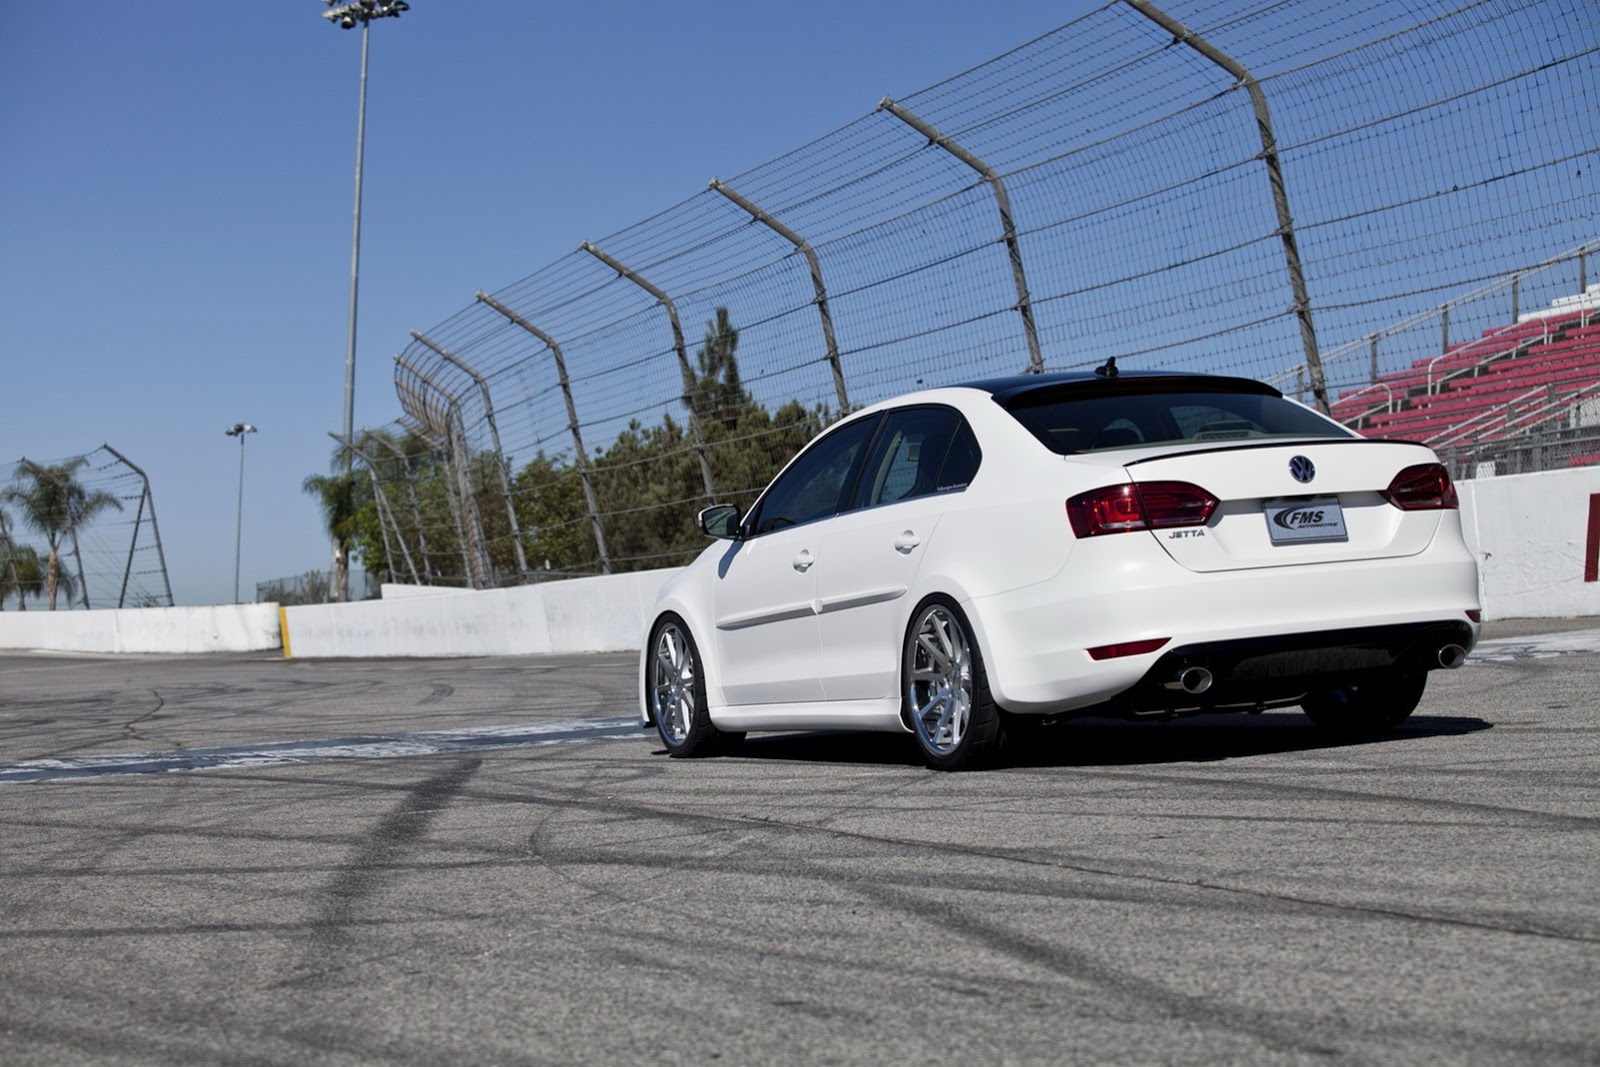 VW Jetta 2.0 TSI Is Here for 2013 SEMA - autoevolution